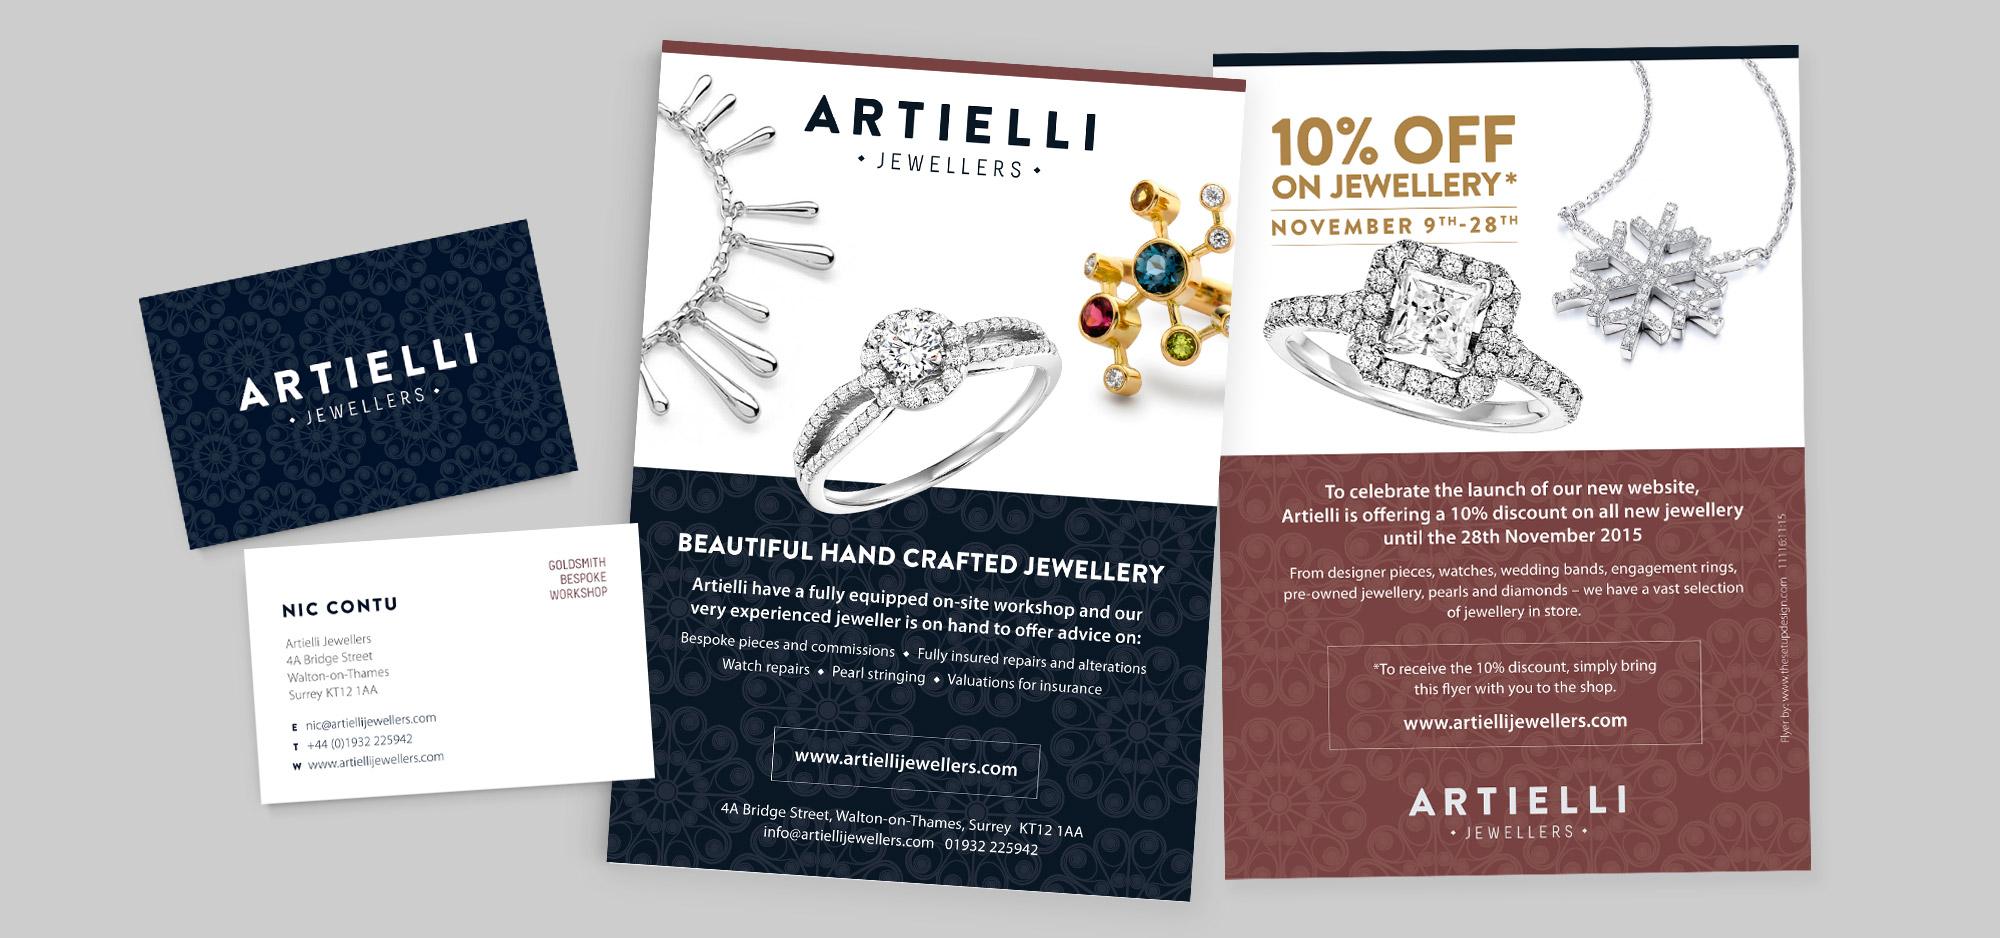 artielli_branding_1